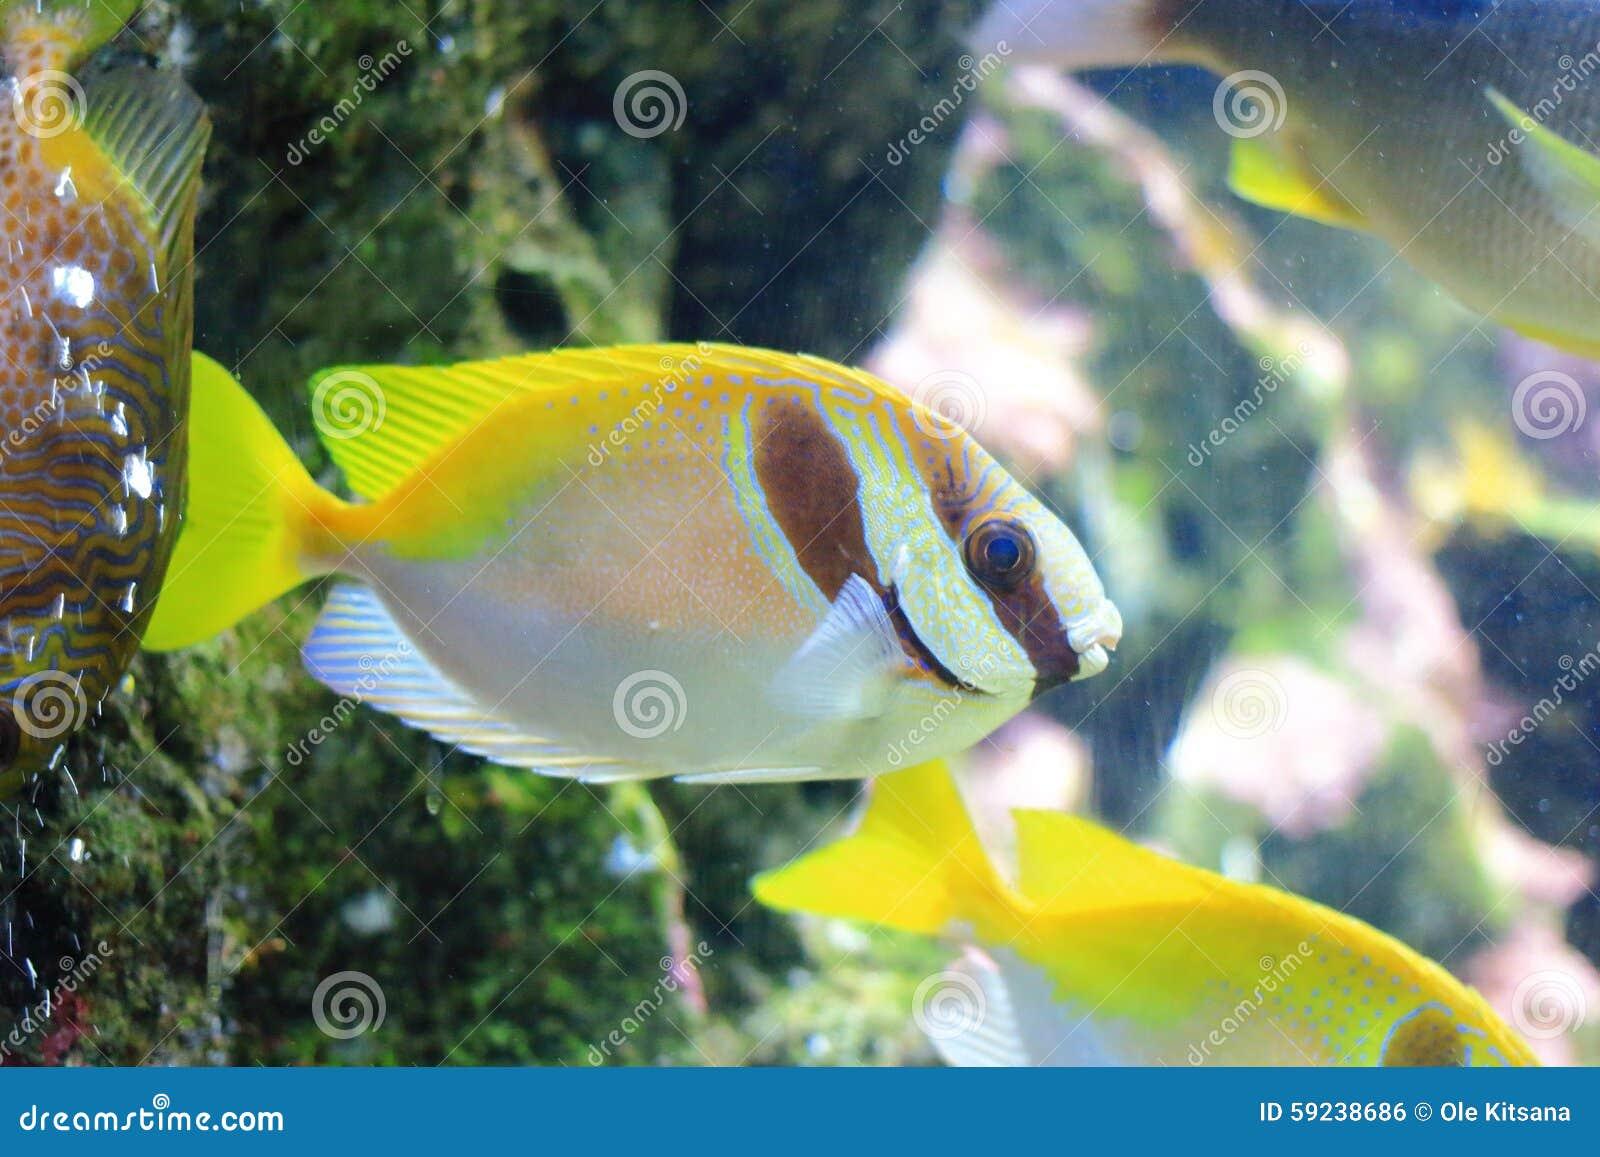 Surgeonfish alargado